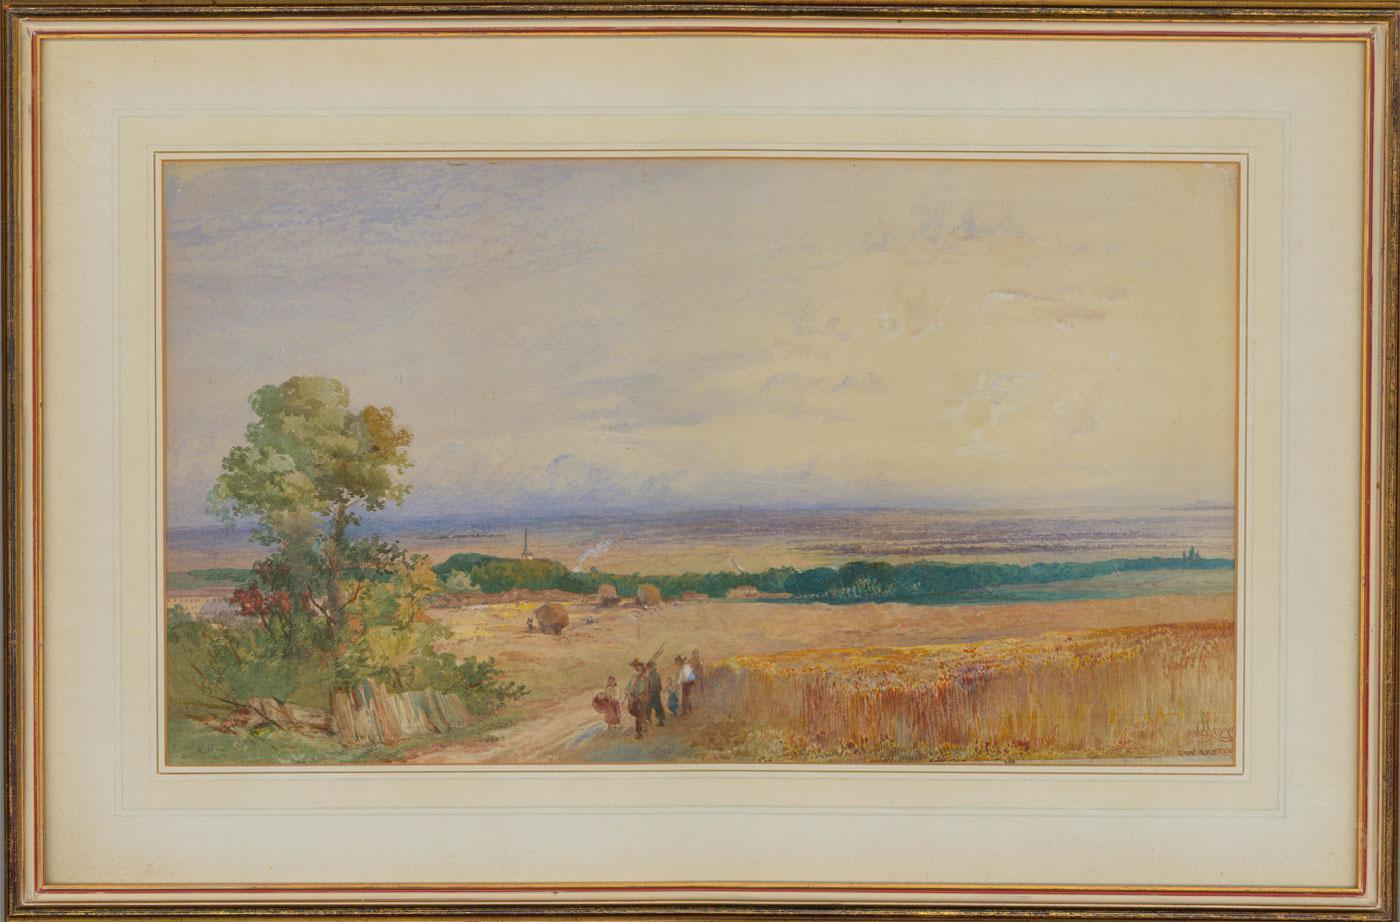 James Vivien de Fleury (1847-1902) - Framed Watercolour, Return From the Fields